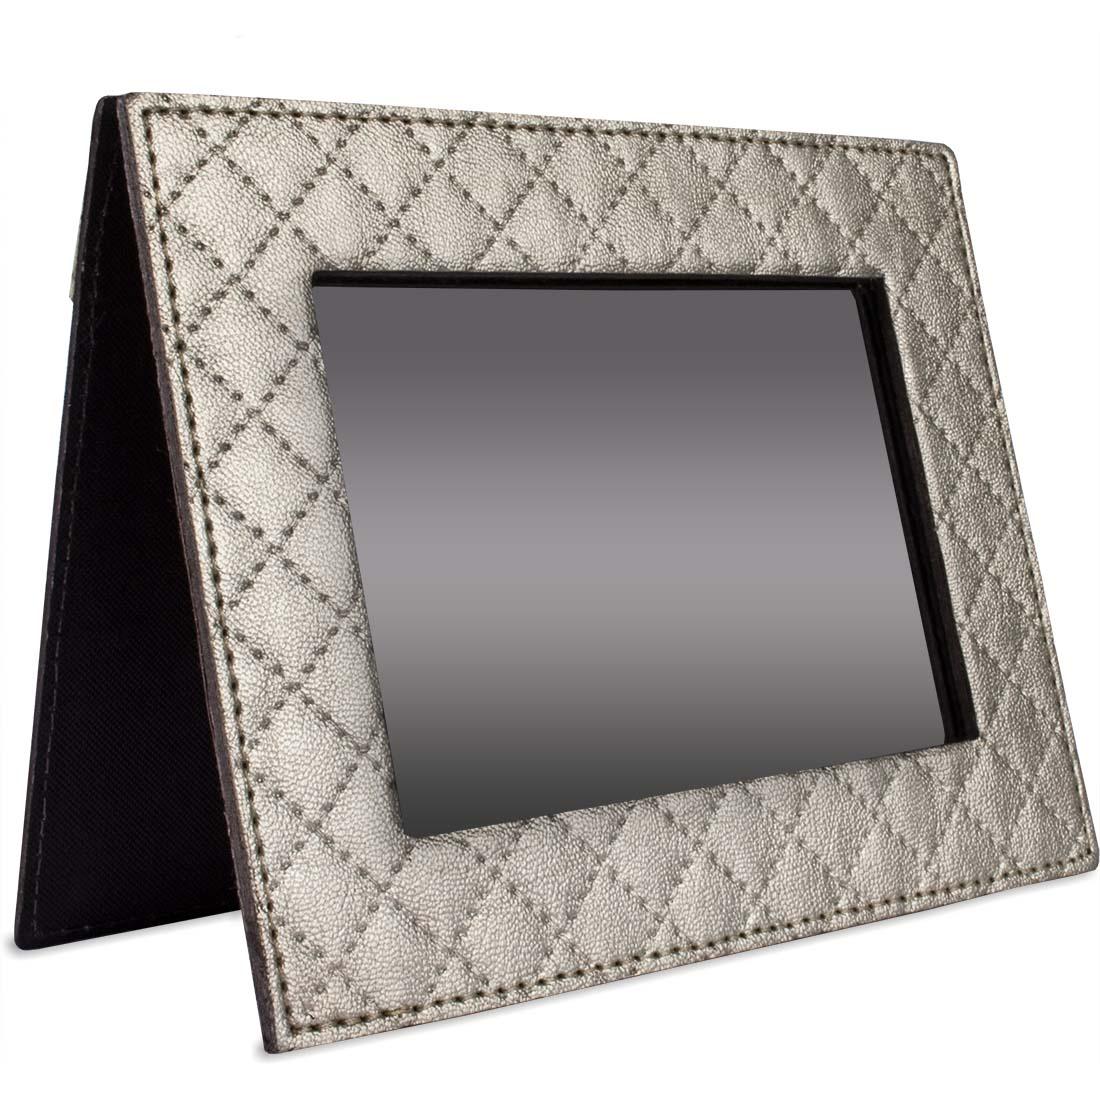 Porta Retrato Risque Rabisque c/ Espelho